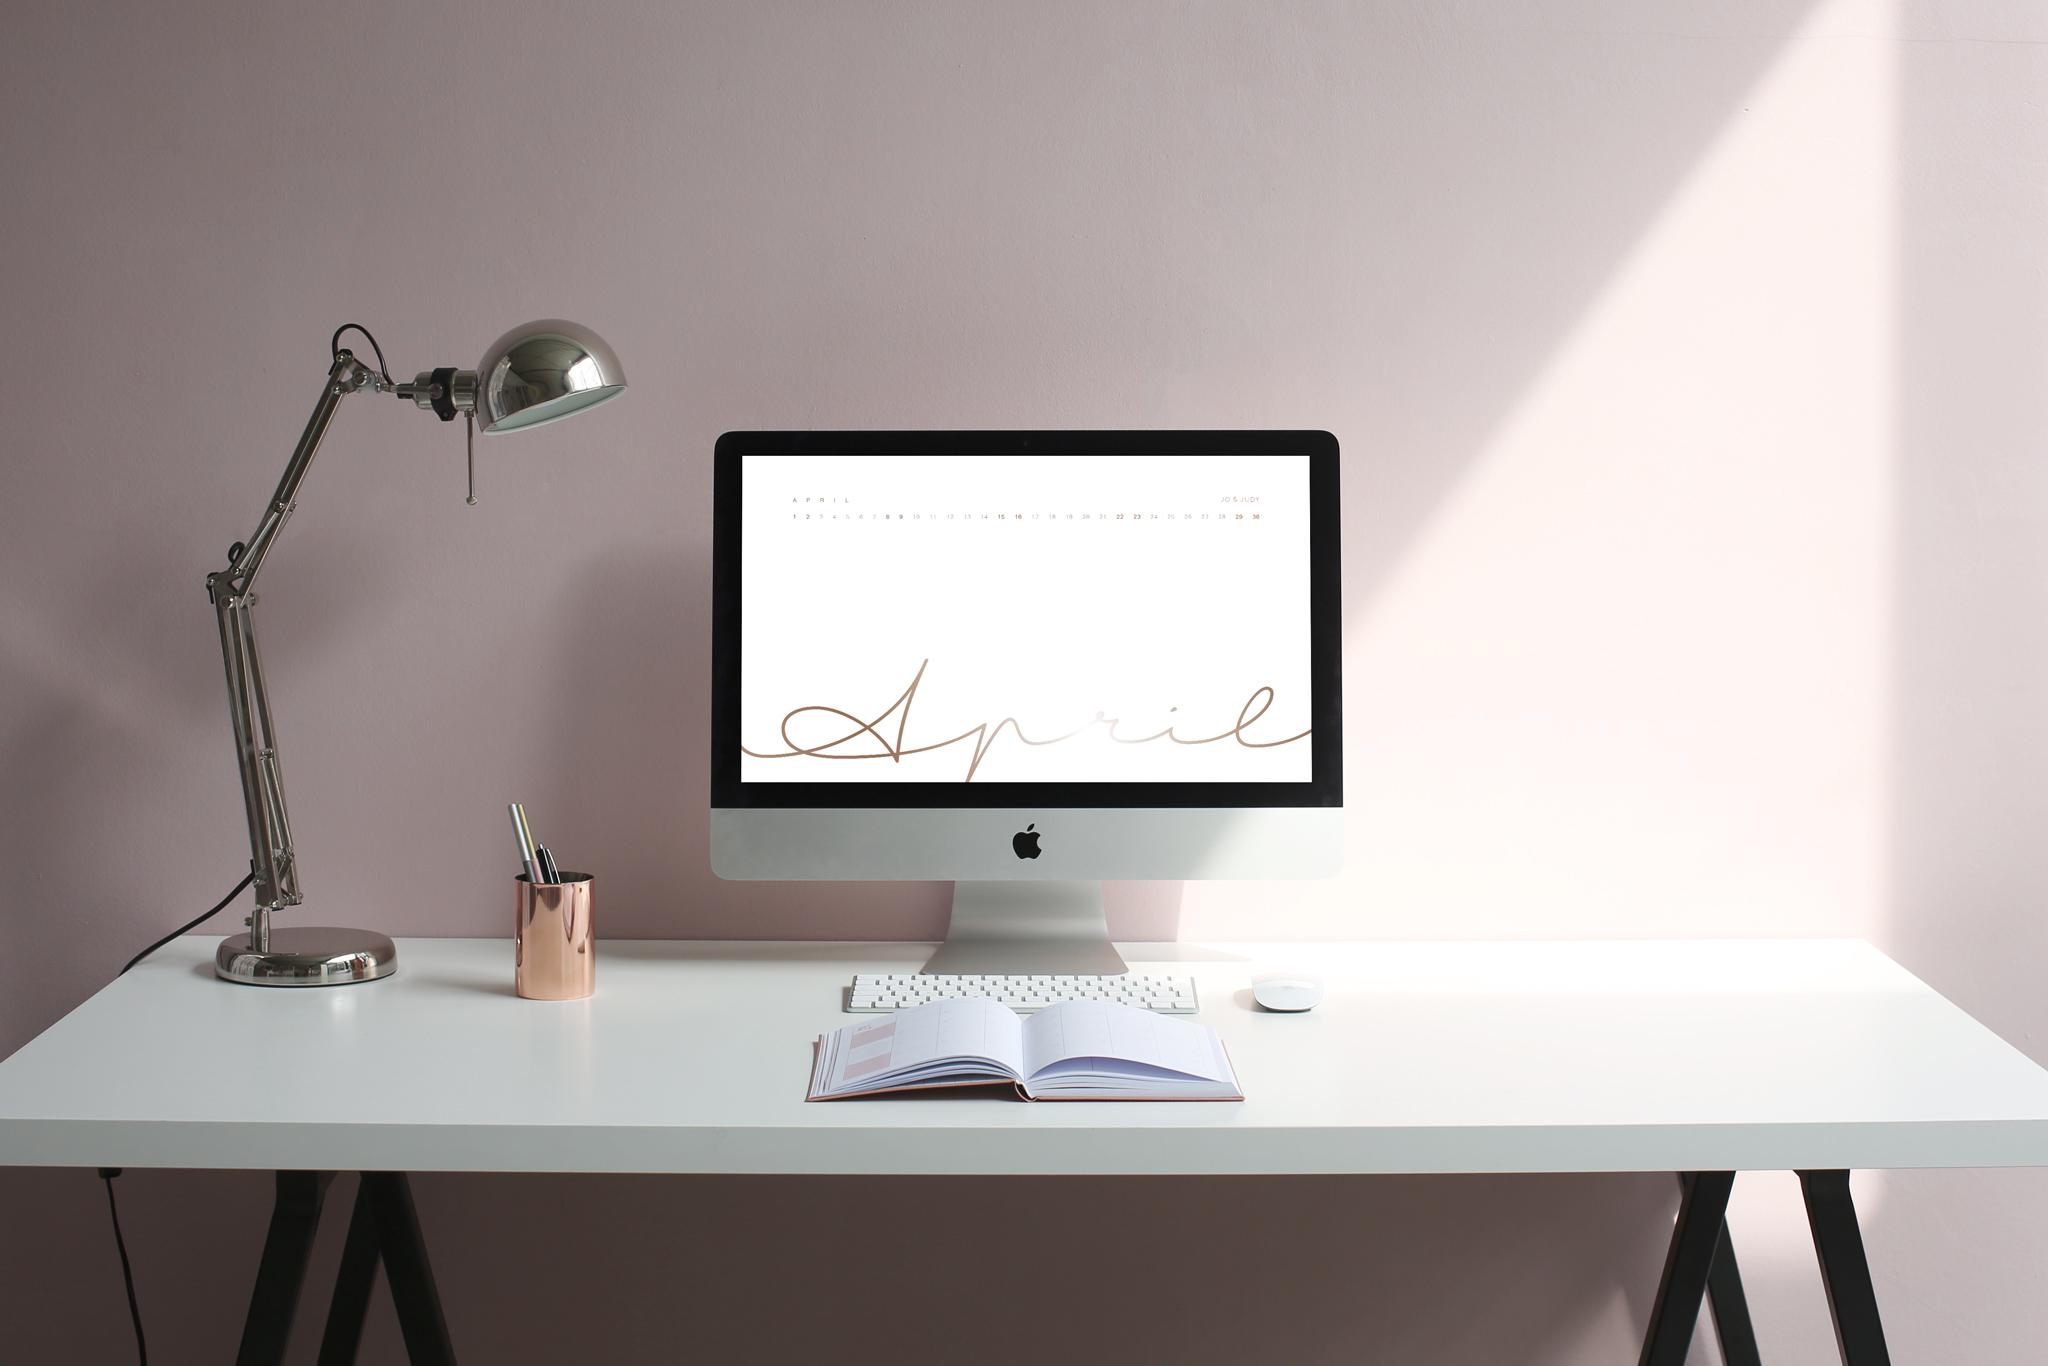 JO-JUDY_Blogpost_Workspace_Situation_01